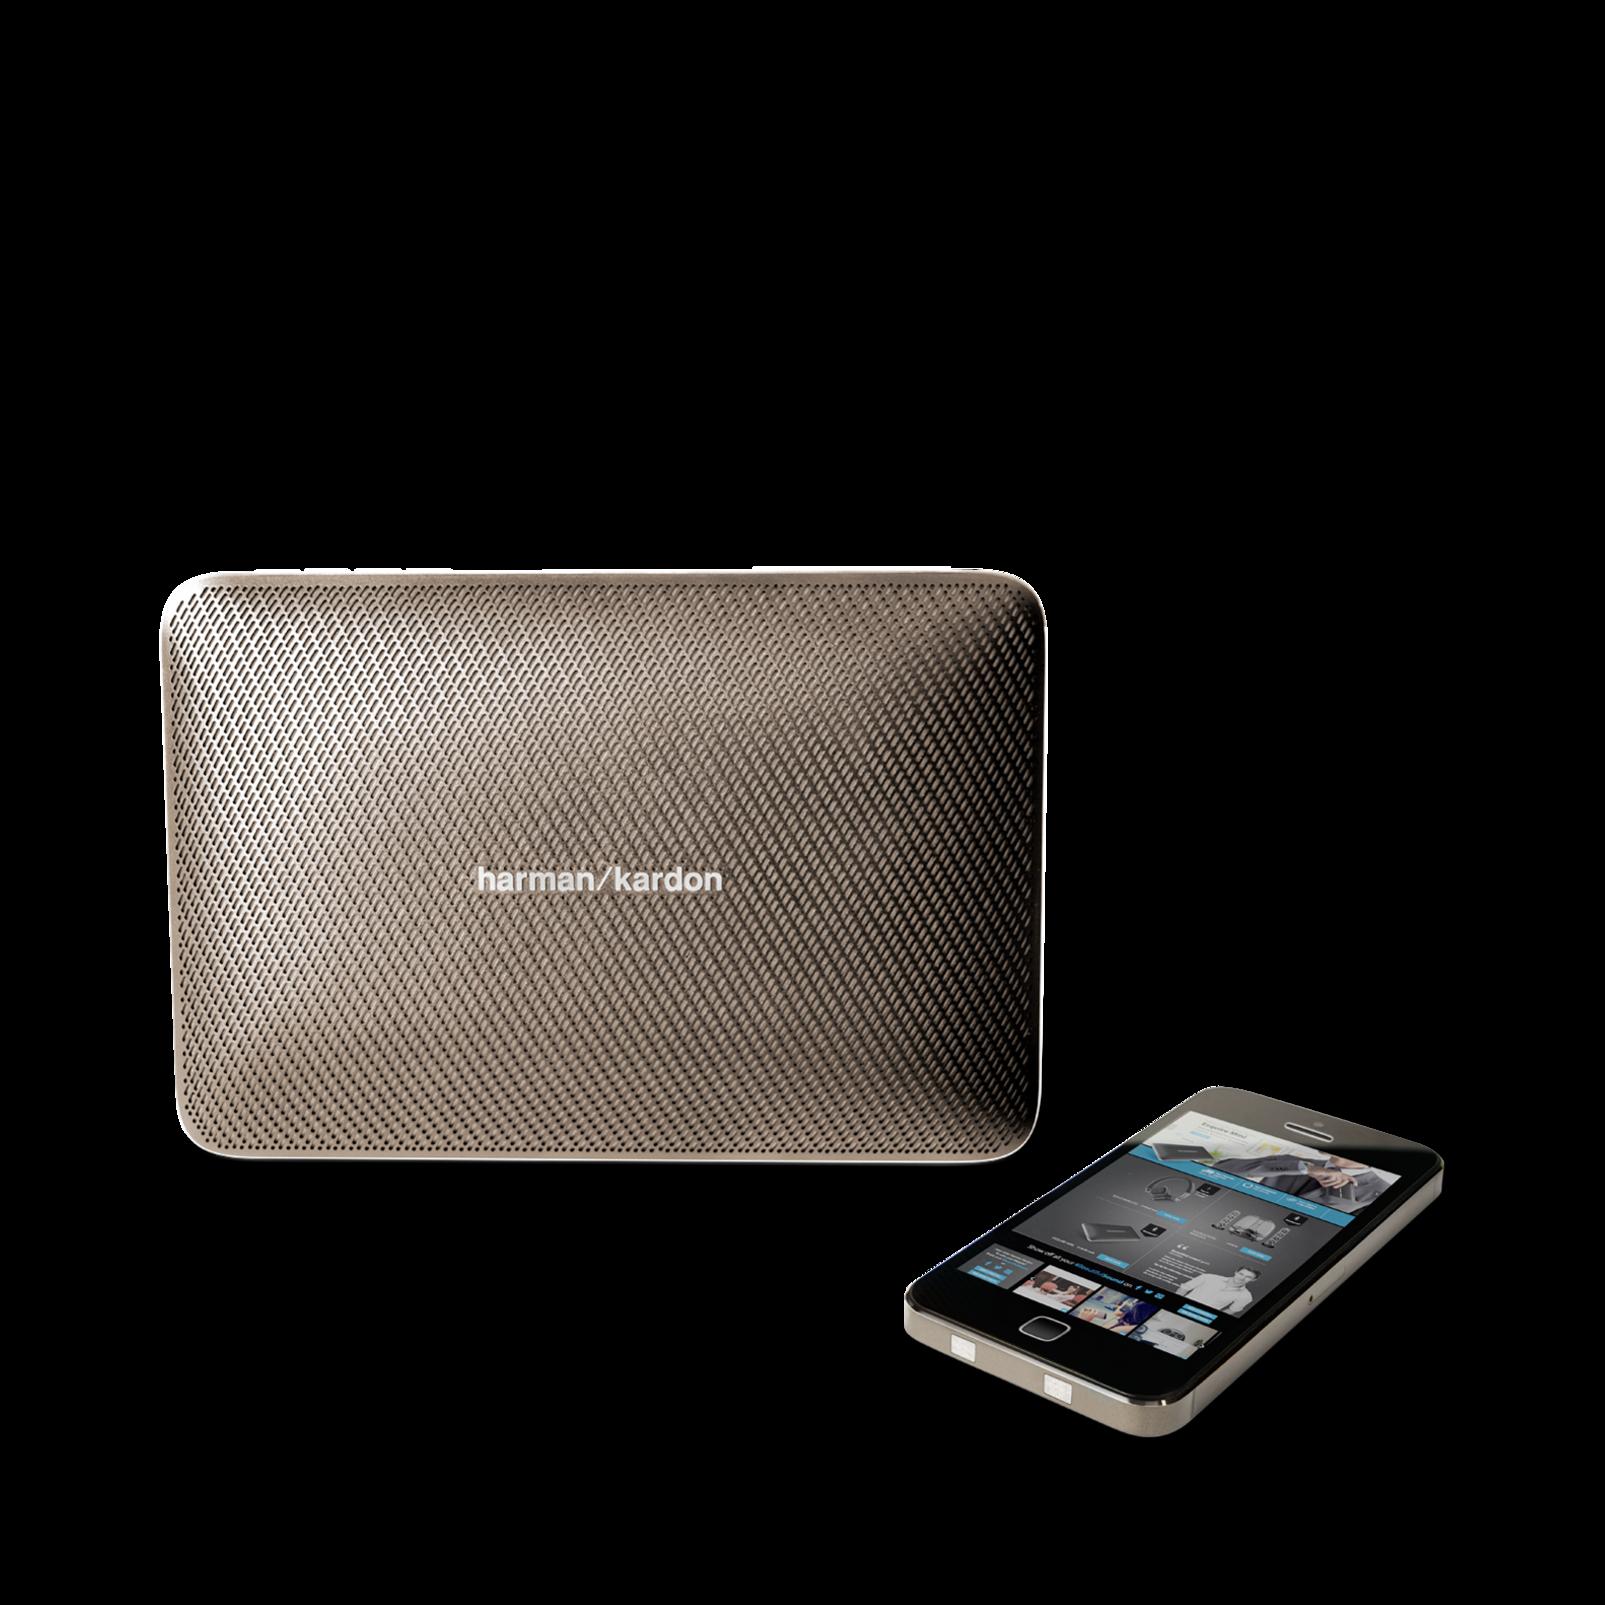 Esquire 2 - Gold - Premium portable Bluetooth speaker with quad microphone conferencing system - Detailshot 5